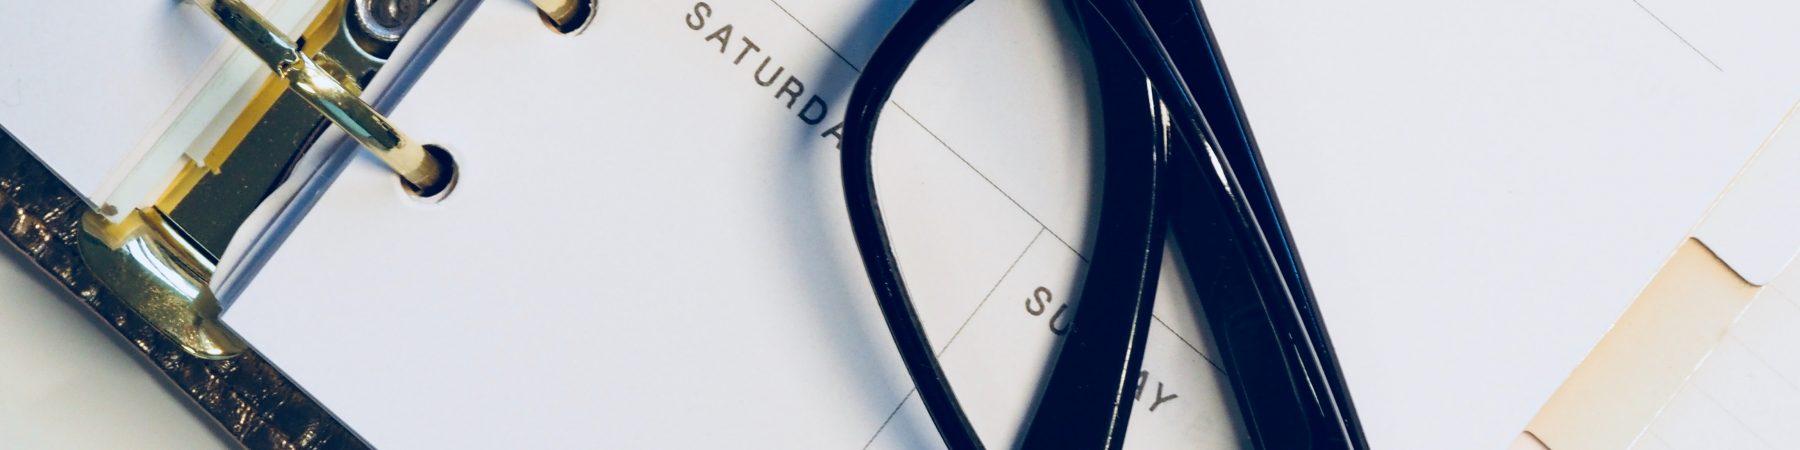 calendar-eyeglasses-eyewear-917293